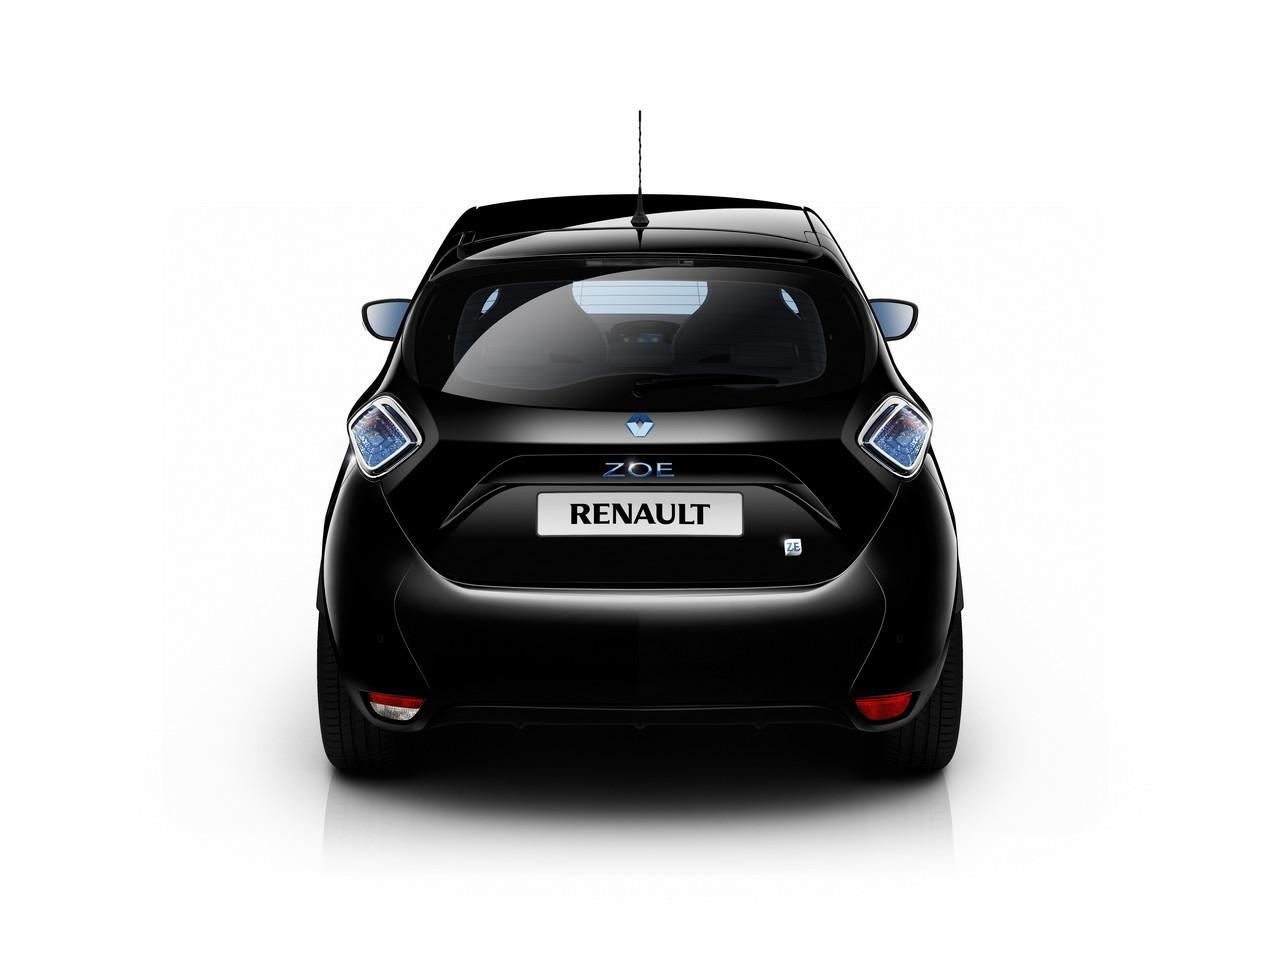 Renault Zo